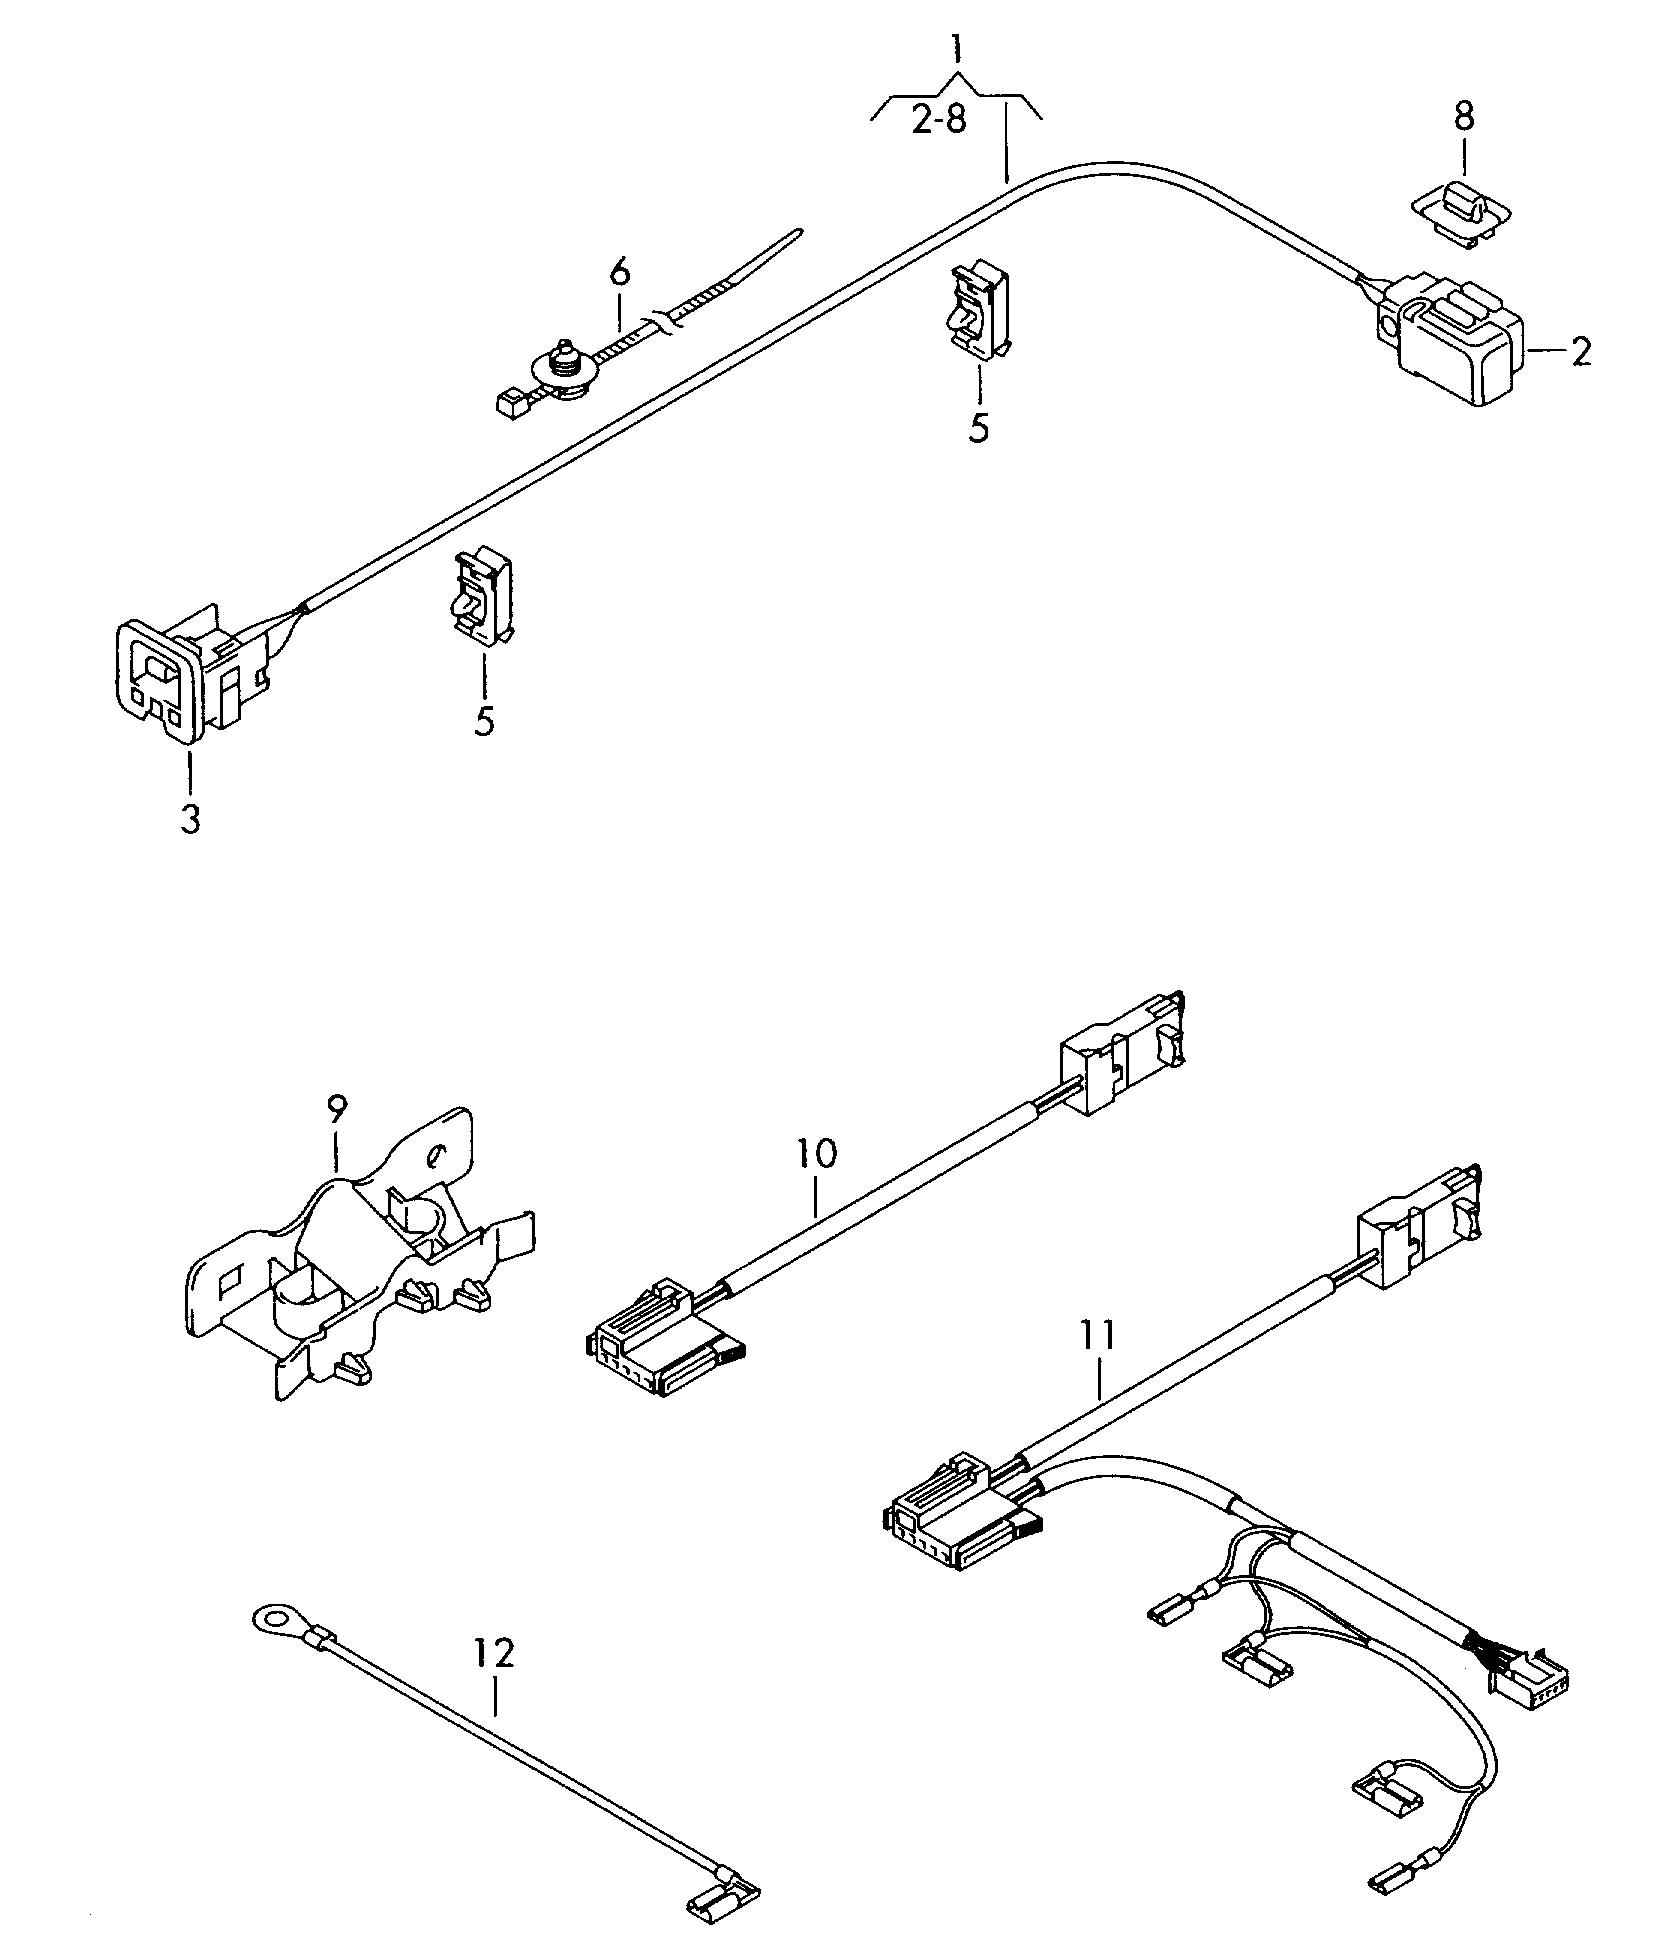 airbag wiring harness  volkswagen transporter kombi (2009 - 2010) / vag etka